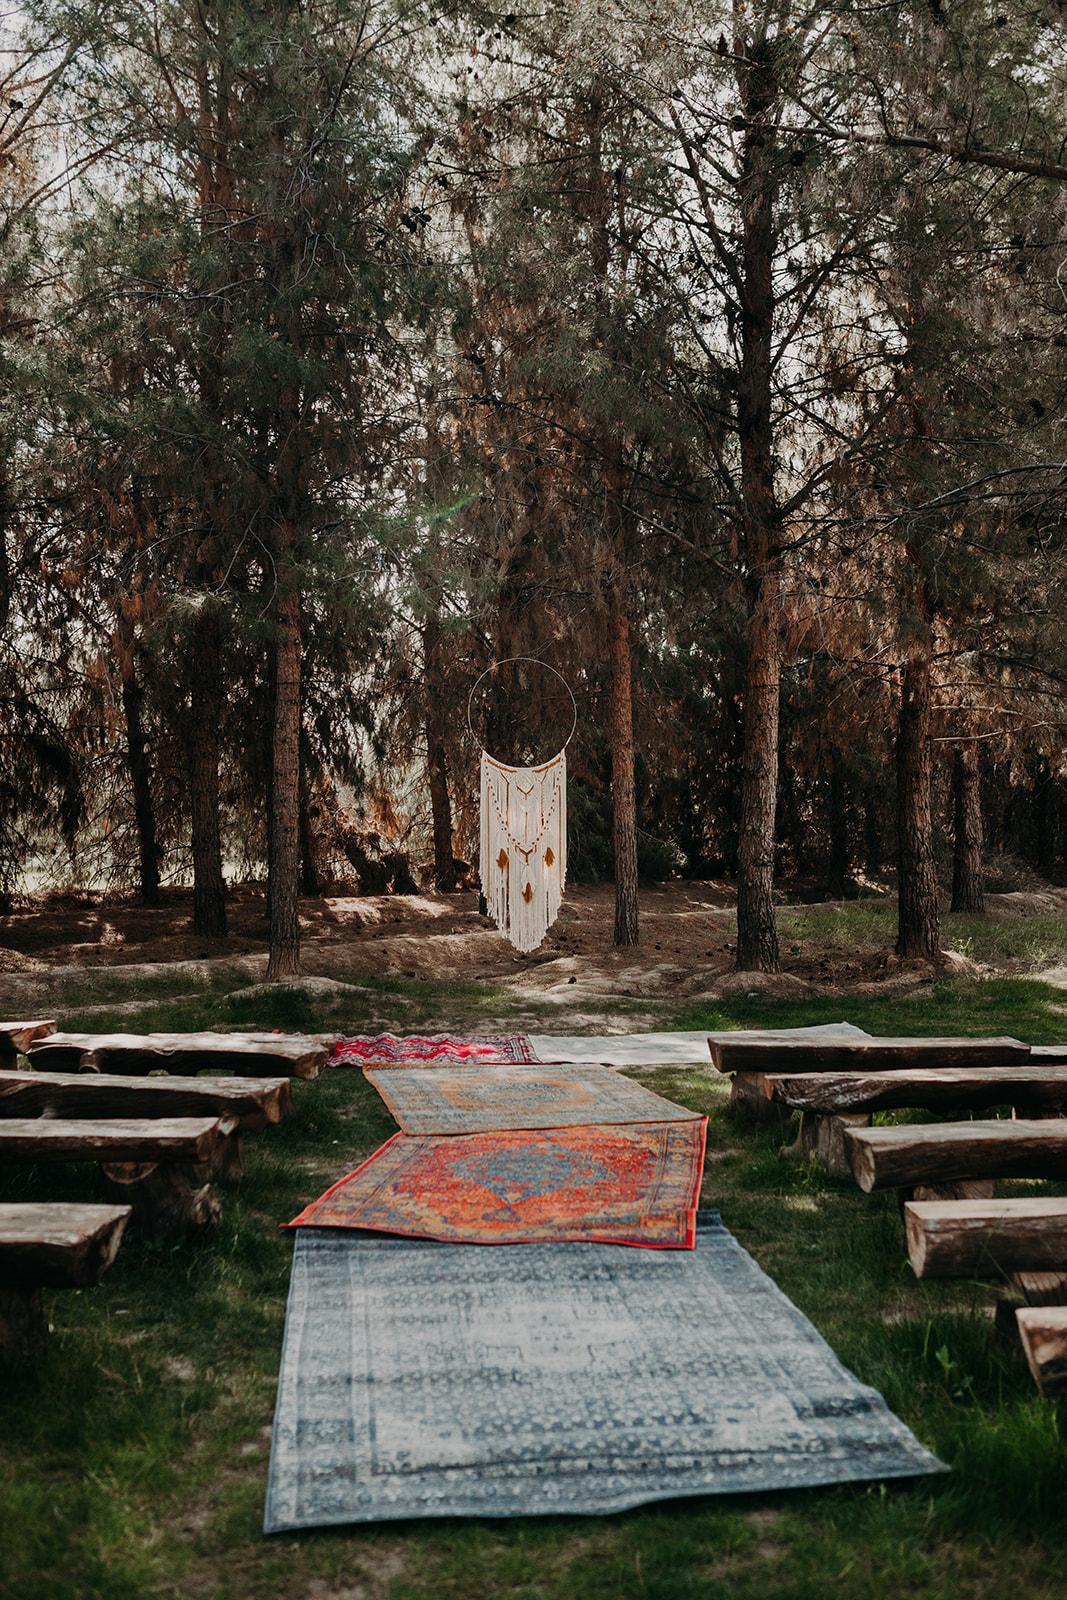 Disney Themed Wedding - Arizona florist Phoenix scottsdale Mesa chandler Sedona Flagstaff Prescott - Dream Catcher Ceremony Decor with Rug Aisle